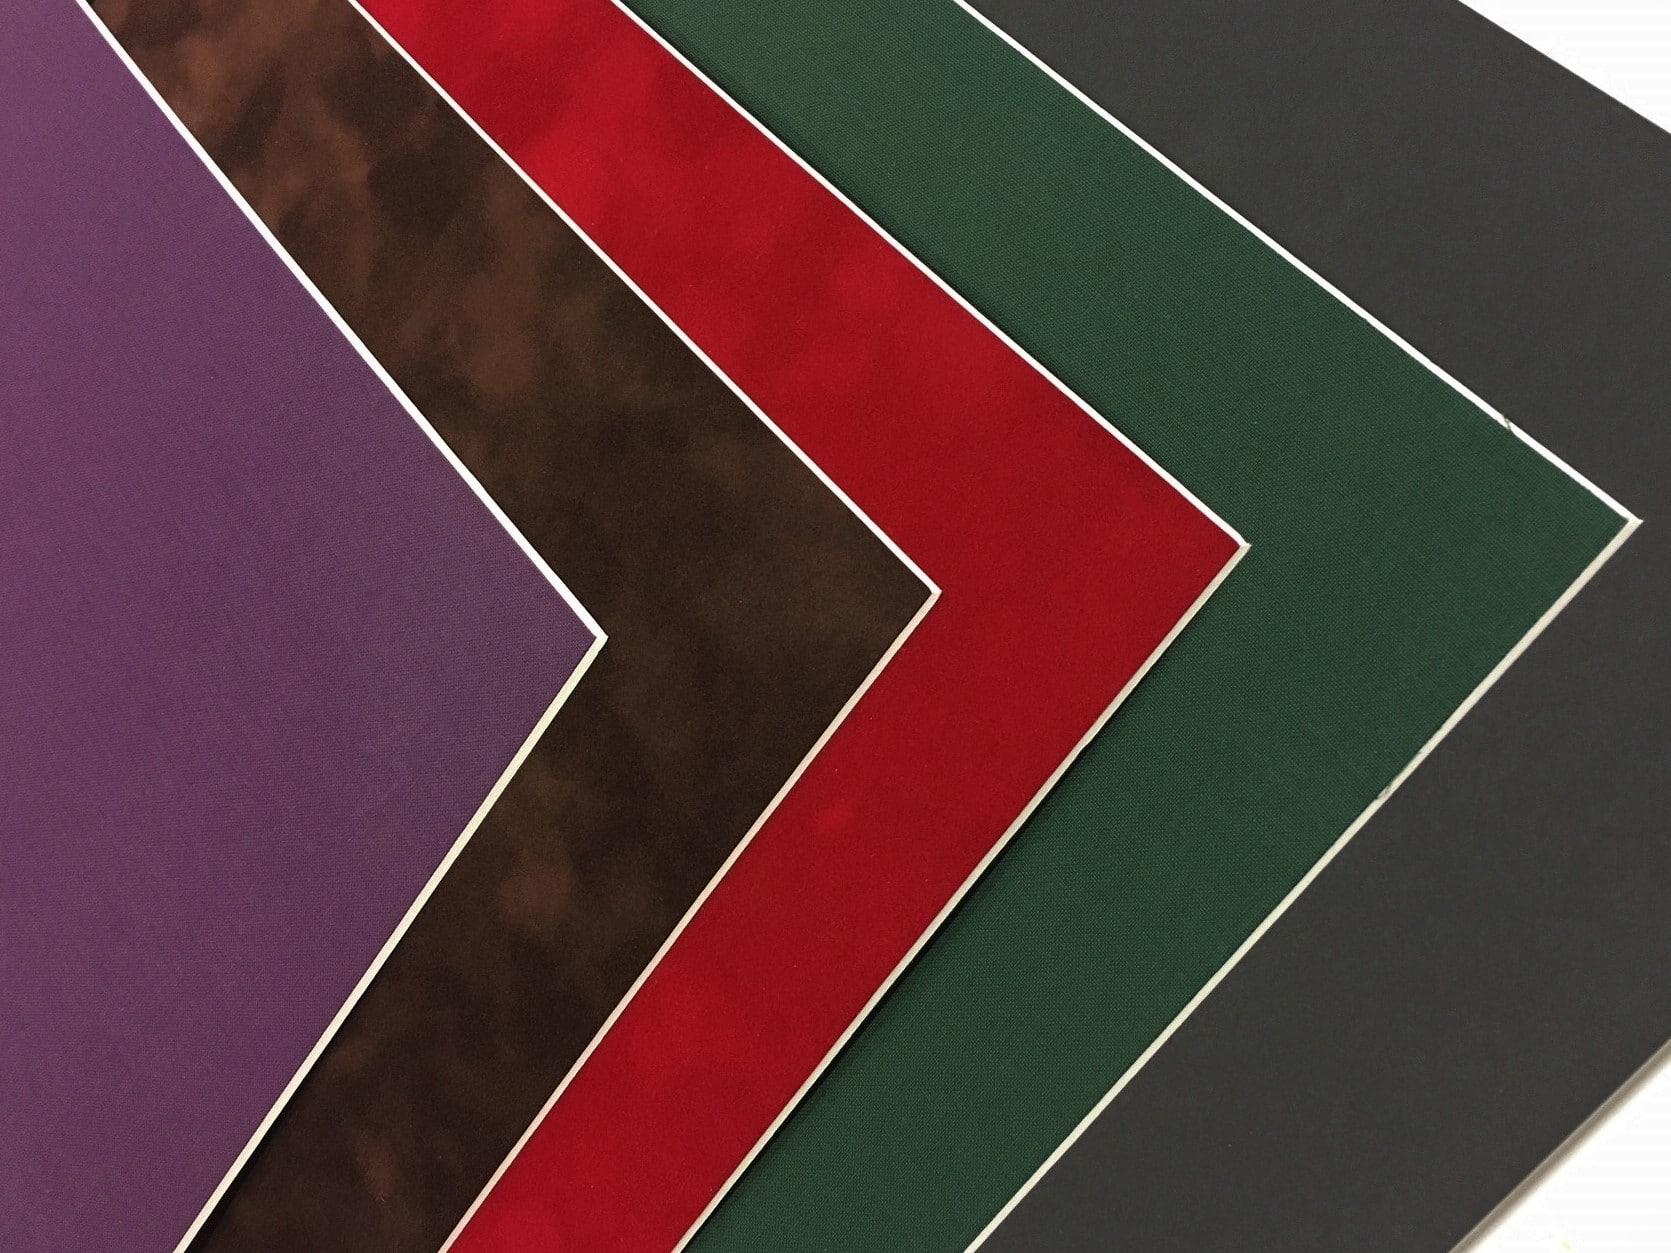 mats picture name by bainbridge nielsen default nielsenbainbridge brand gallery frame wayfair board mat bnd solutions